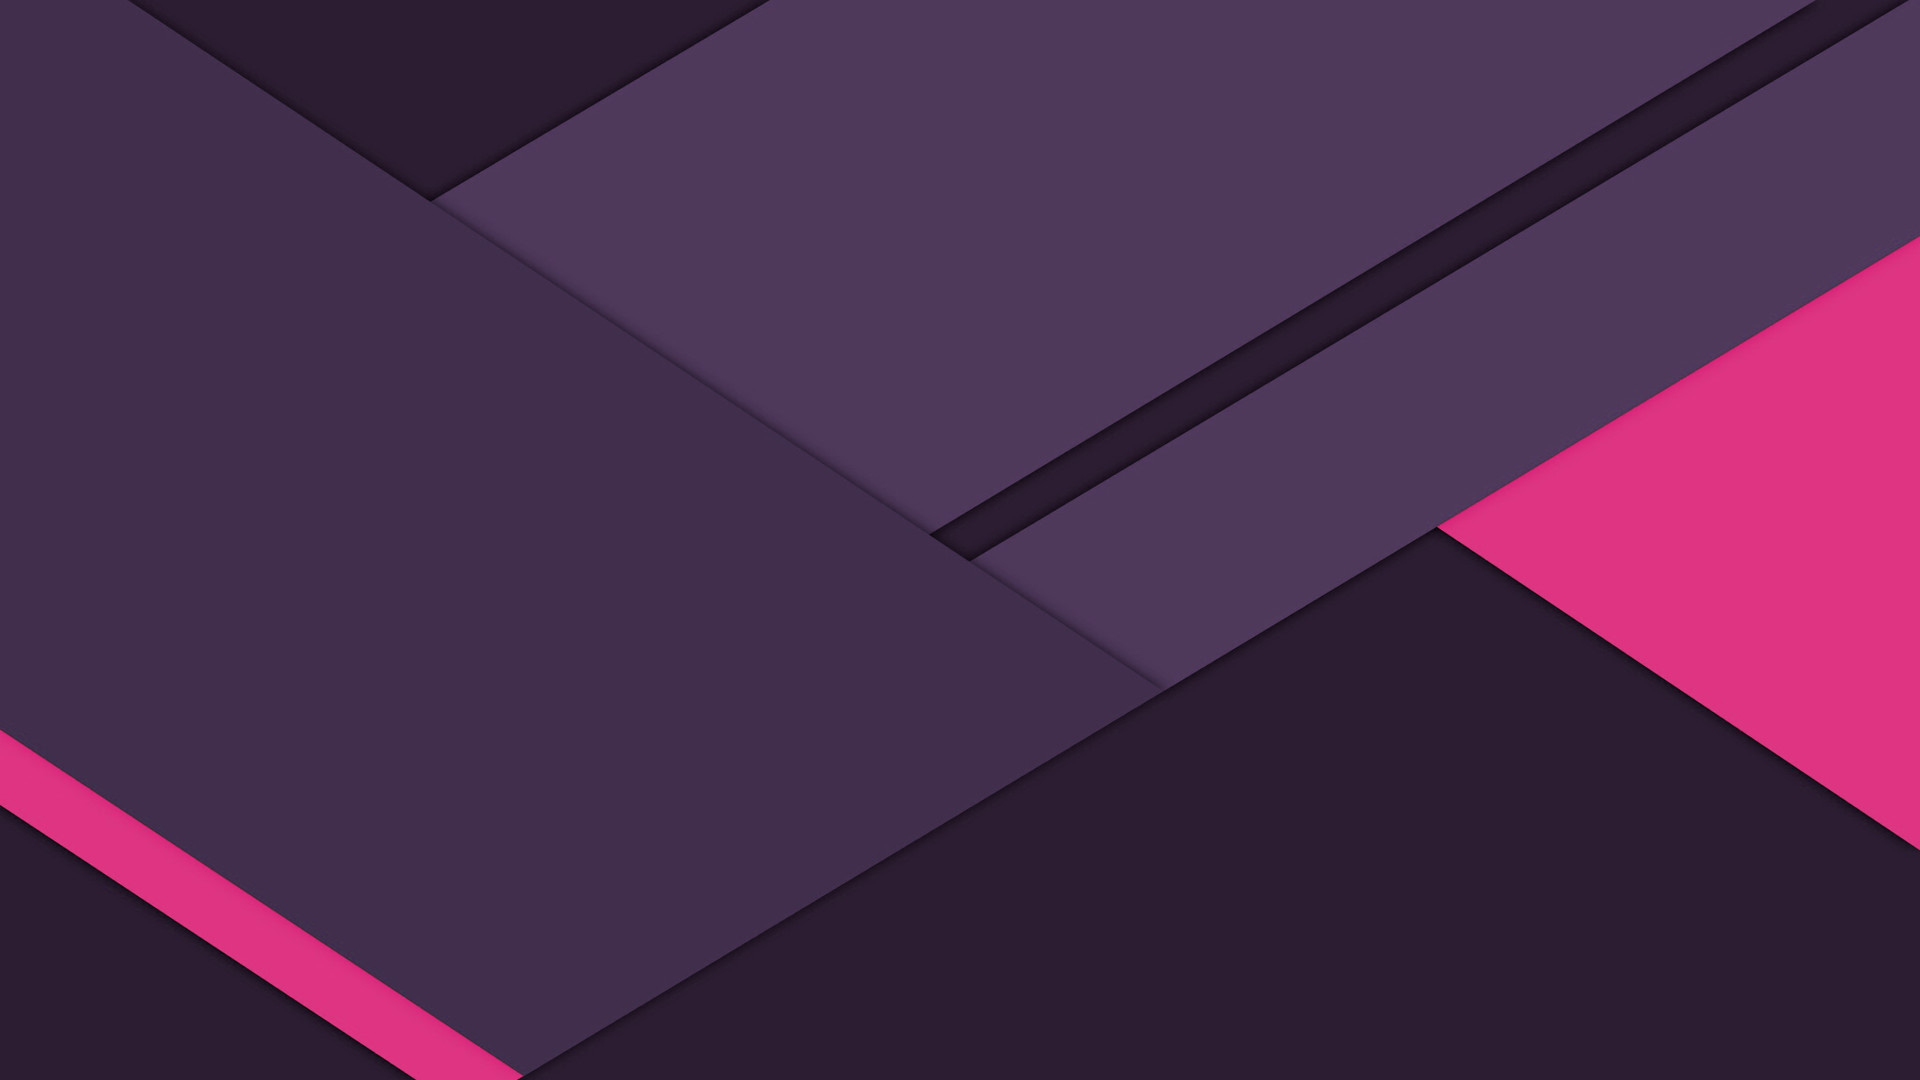 810169 new purple design backgrounds 1920x1080